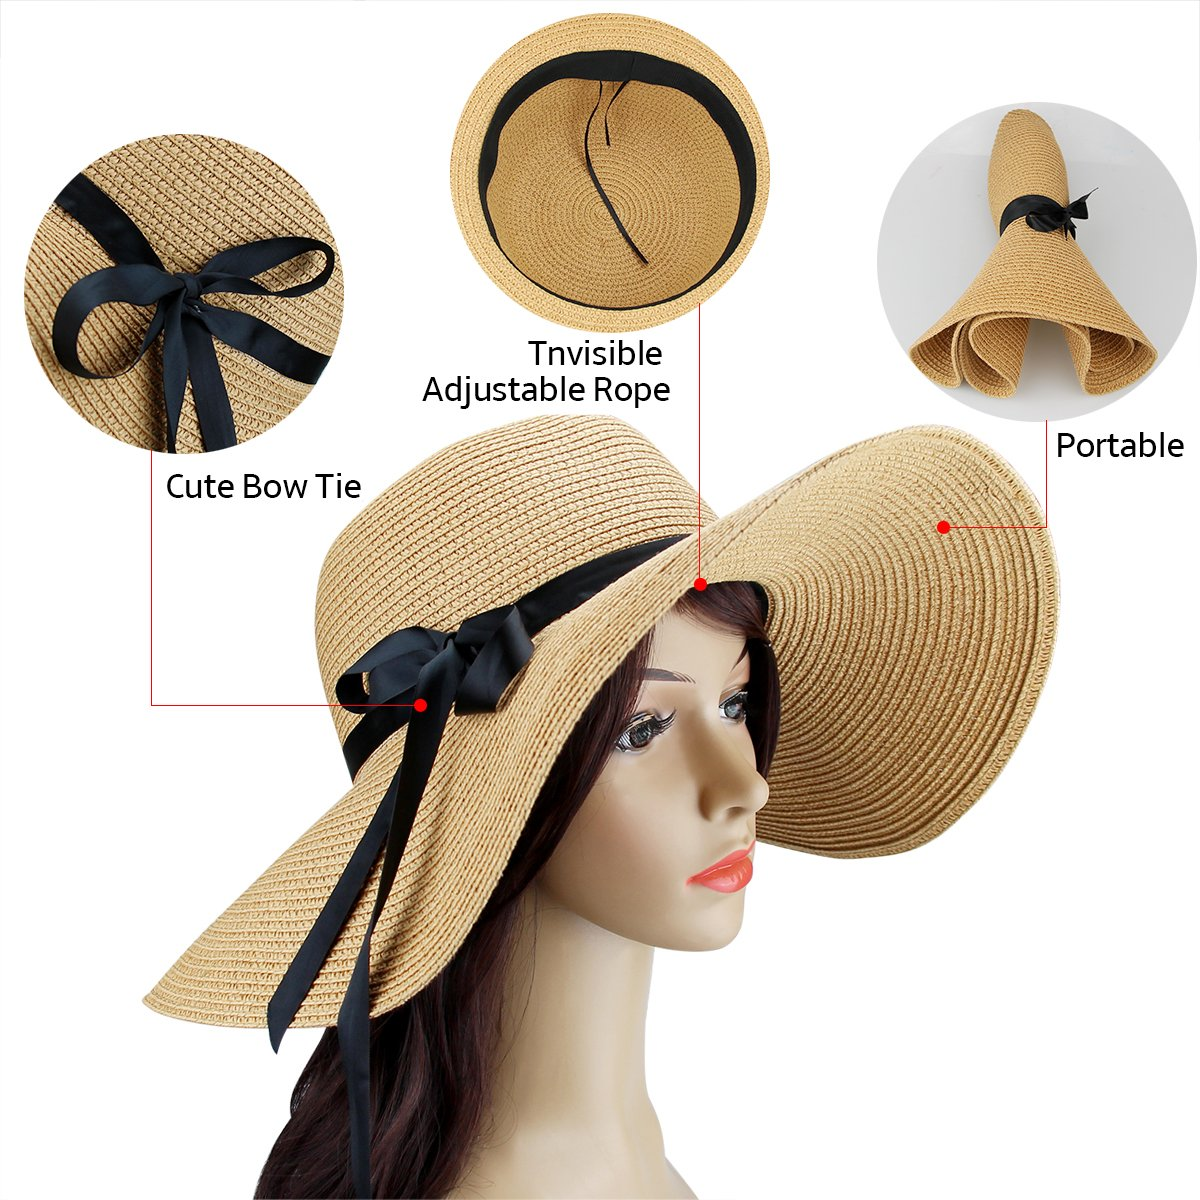 ba3e014661b Pack womens sun hat foldable large wide brim straw hat summer beach cap uv  protection beige